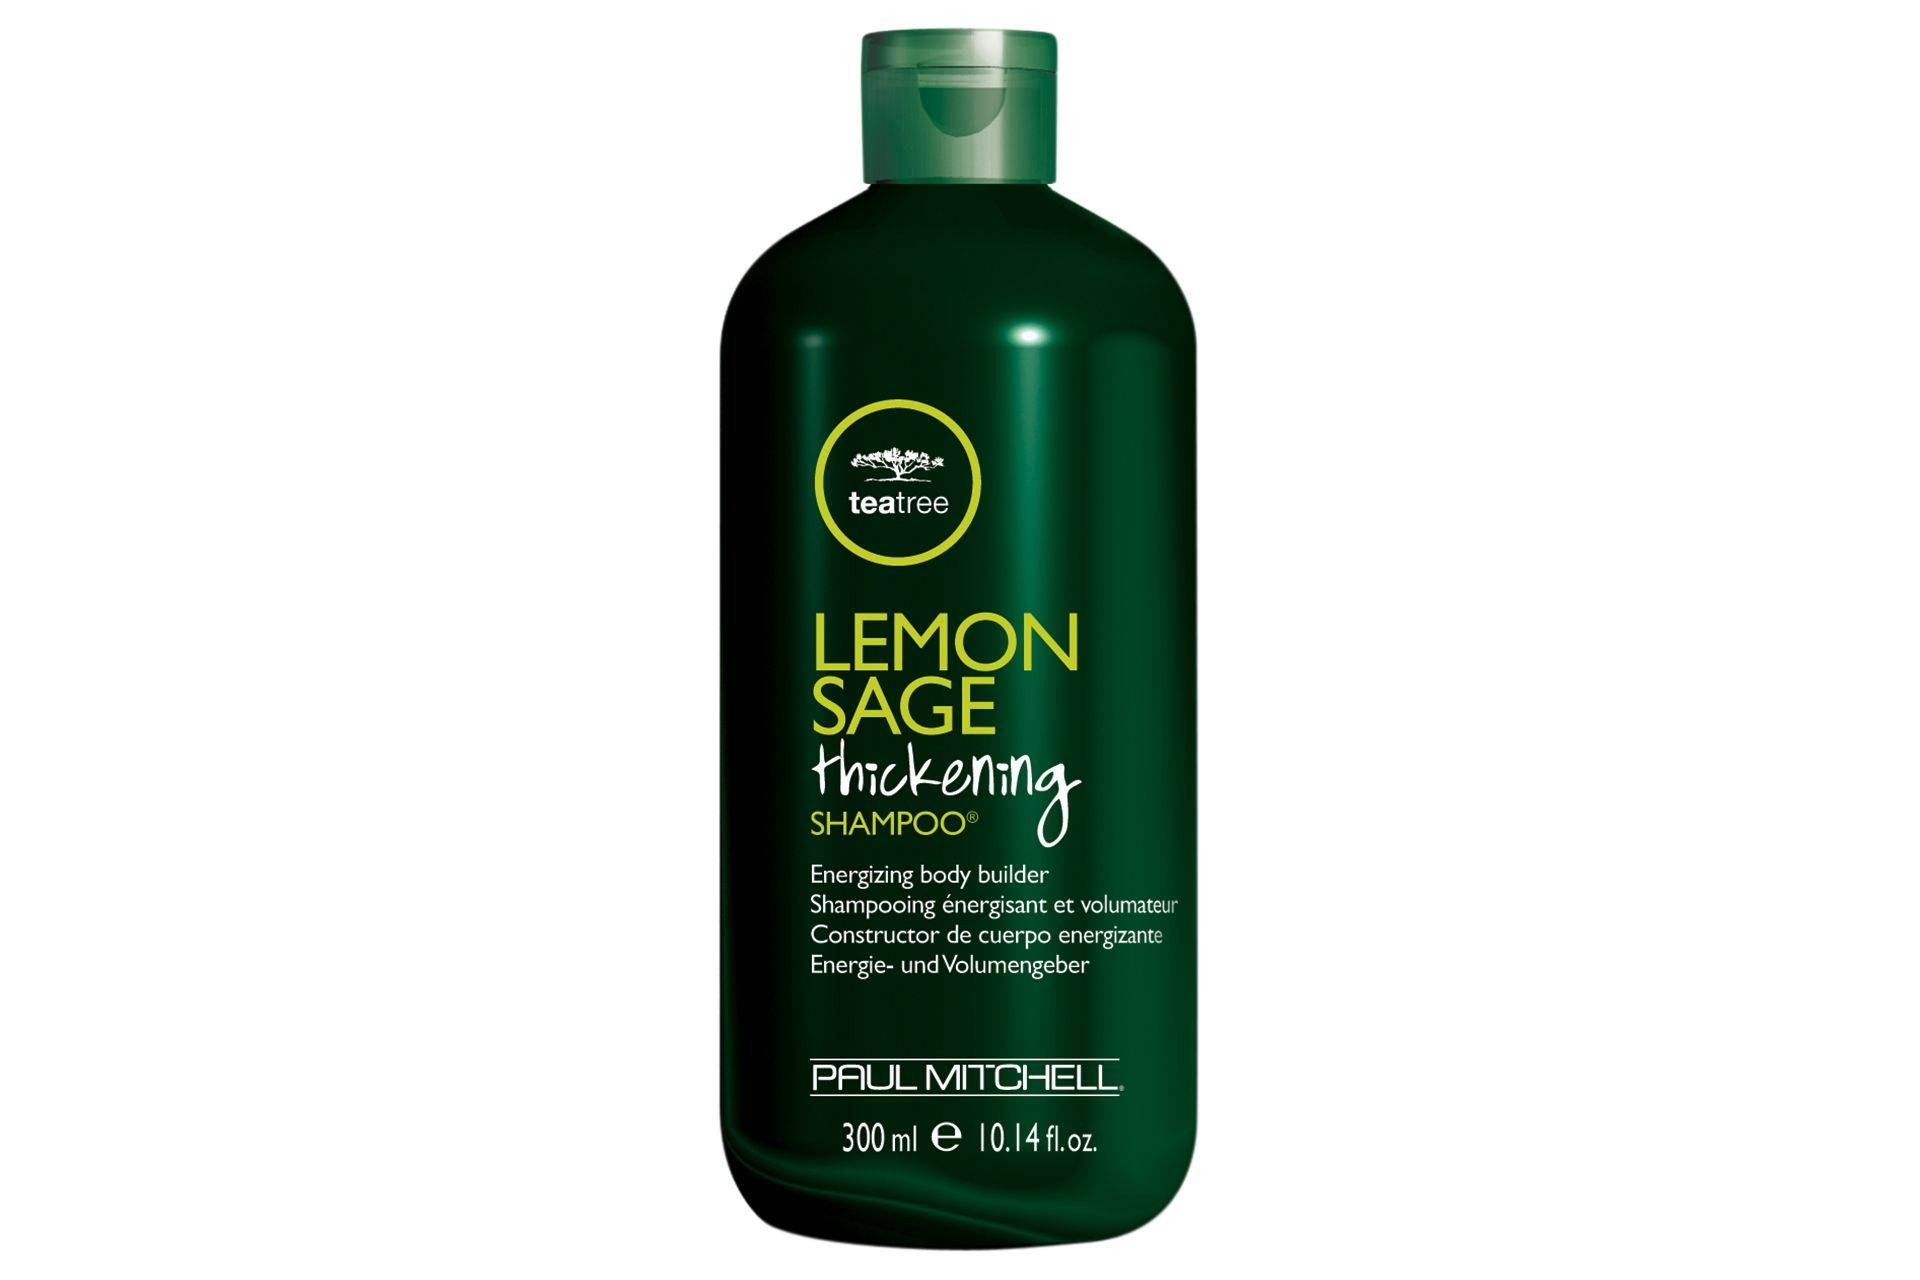 The best shampoo for thin & fine hair; aveda, kerastase, ogx ...